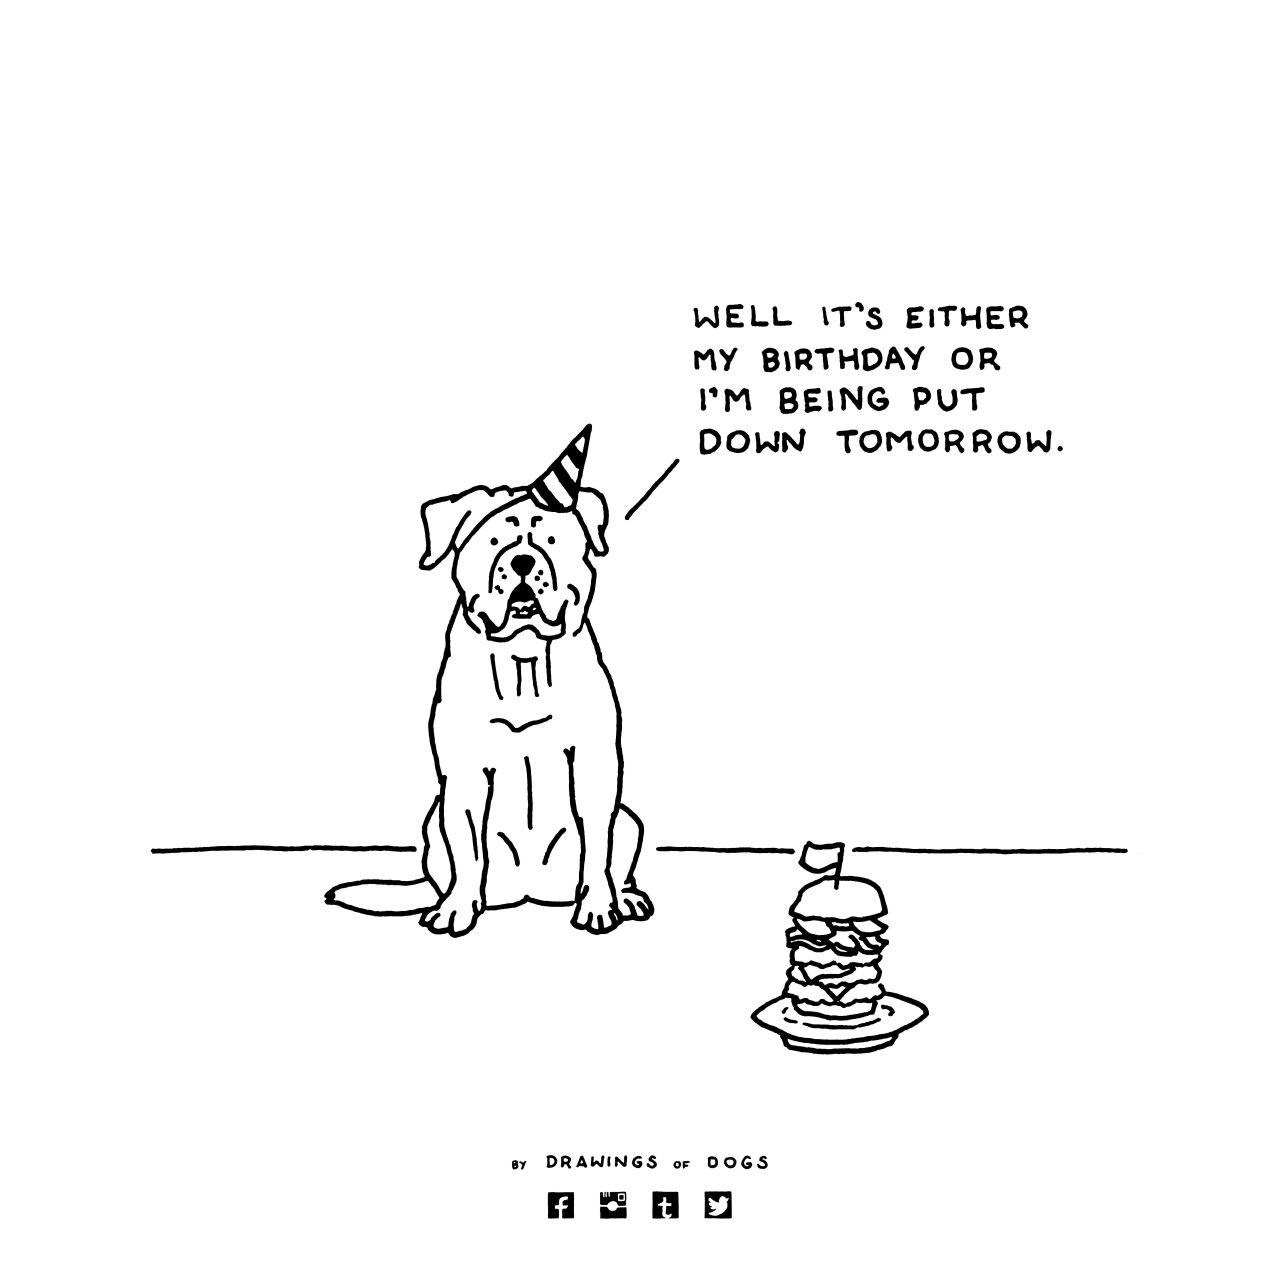 Tastefully Offensive On Tumblr Gave My Dog A Burger